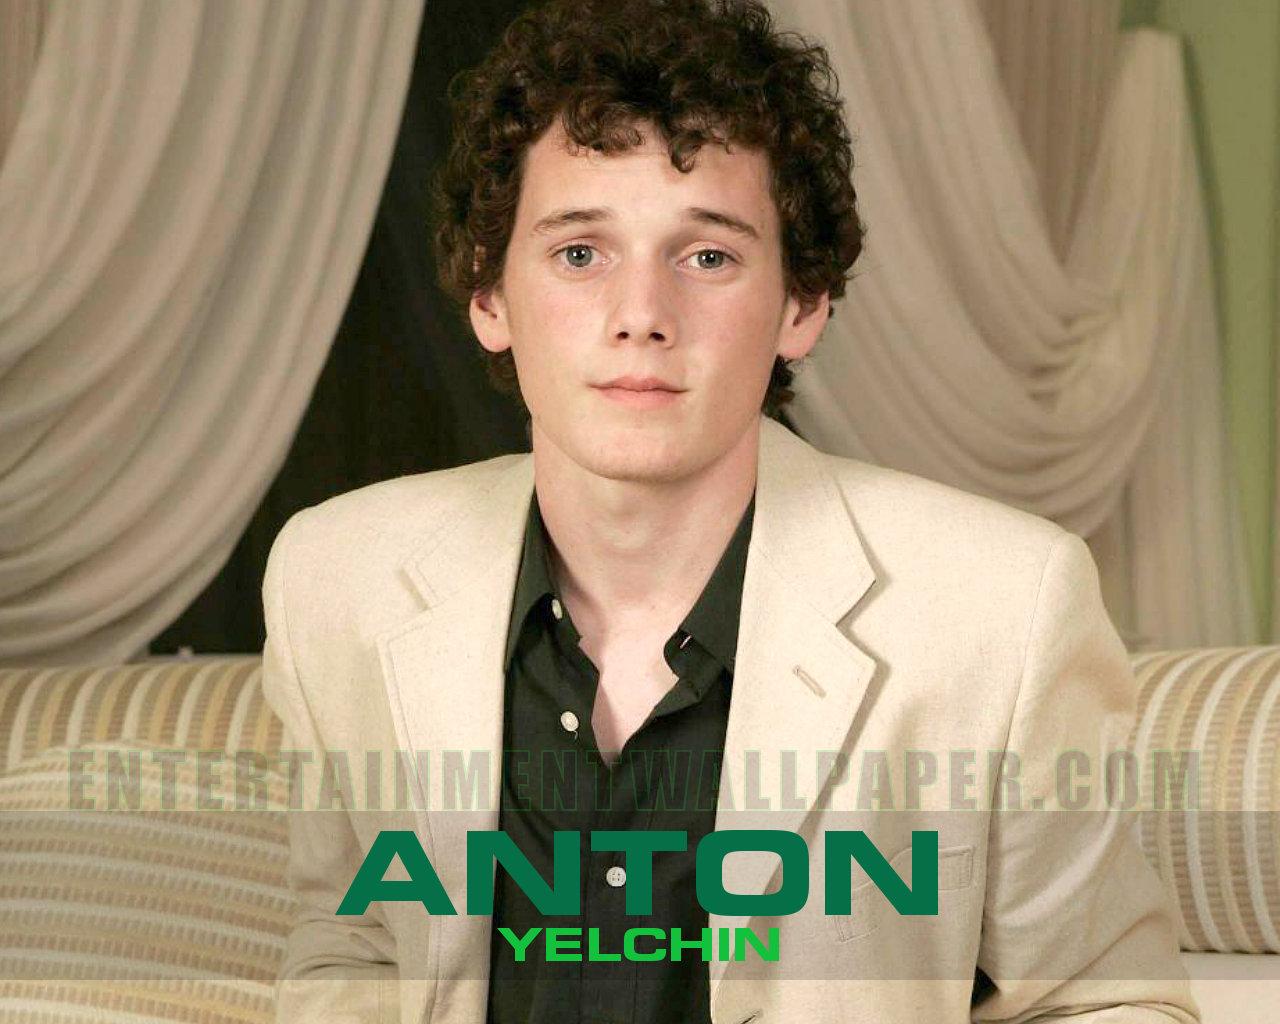 who is anton yelchin dating